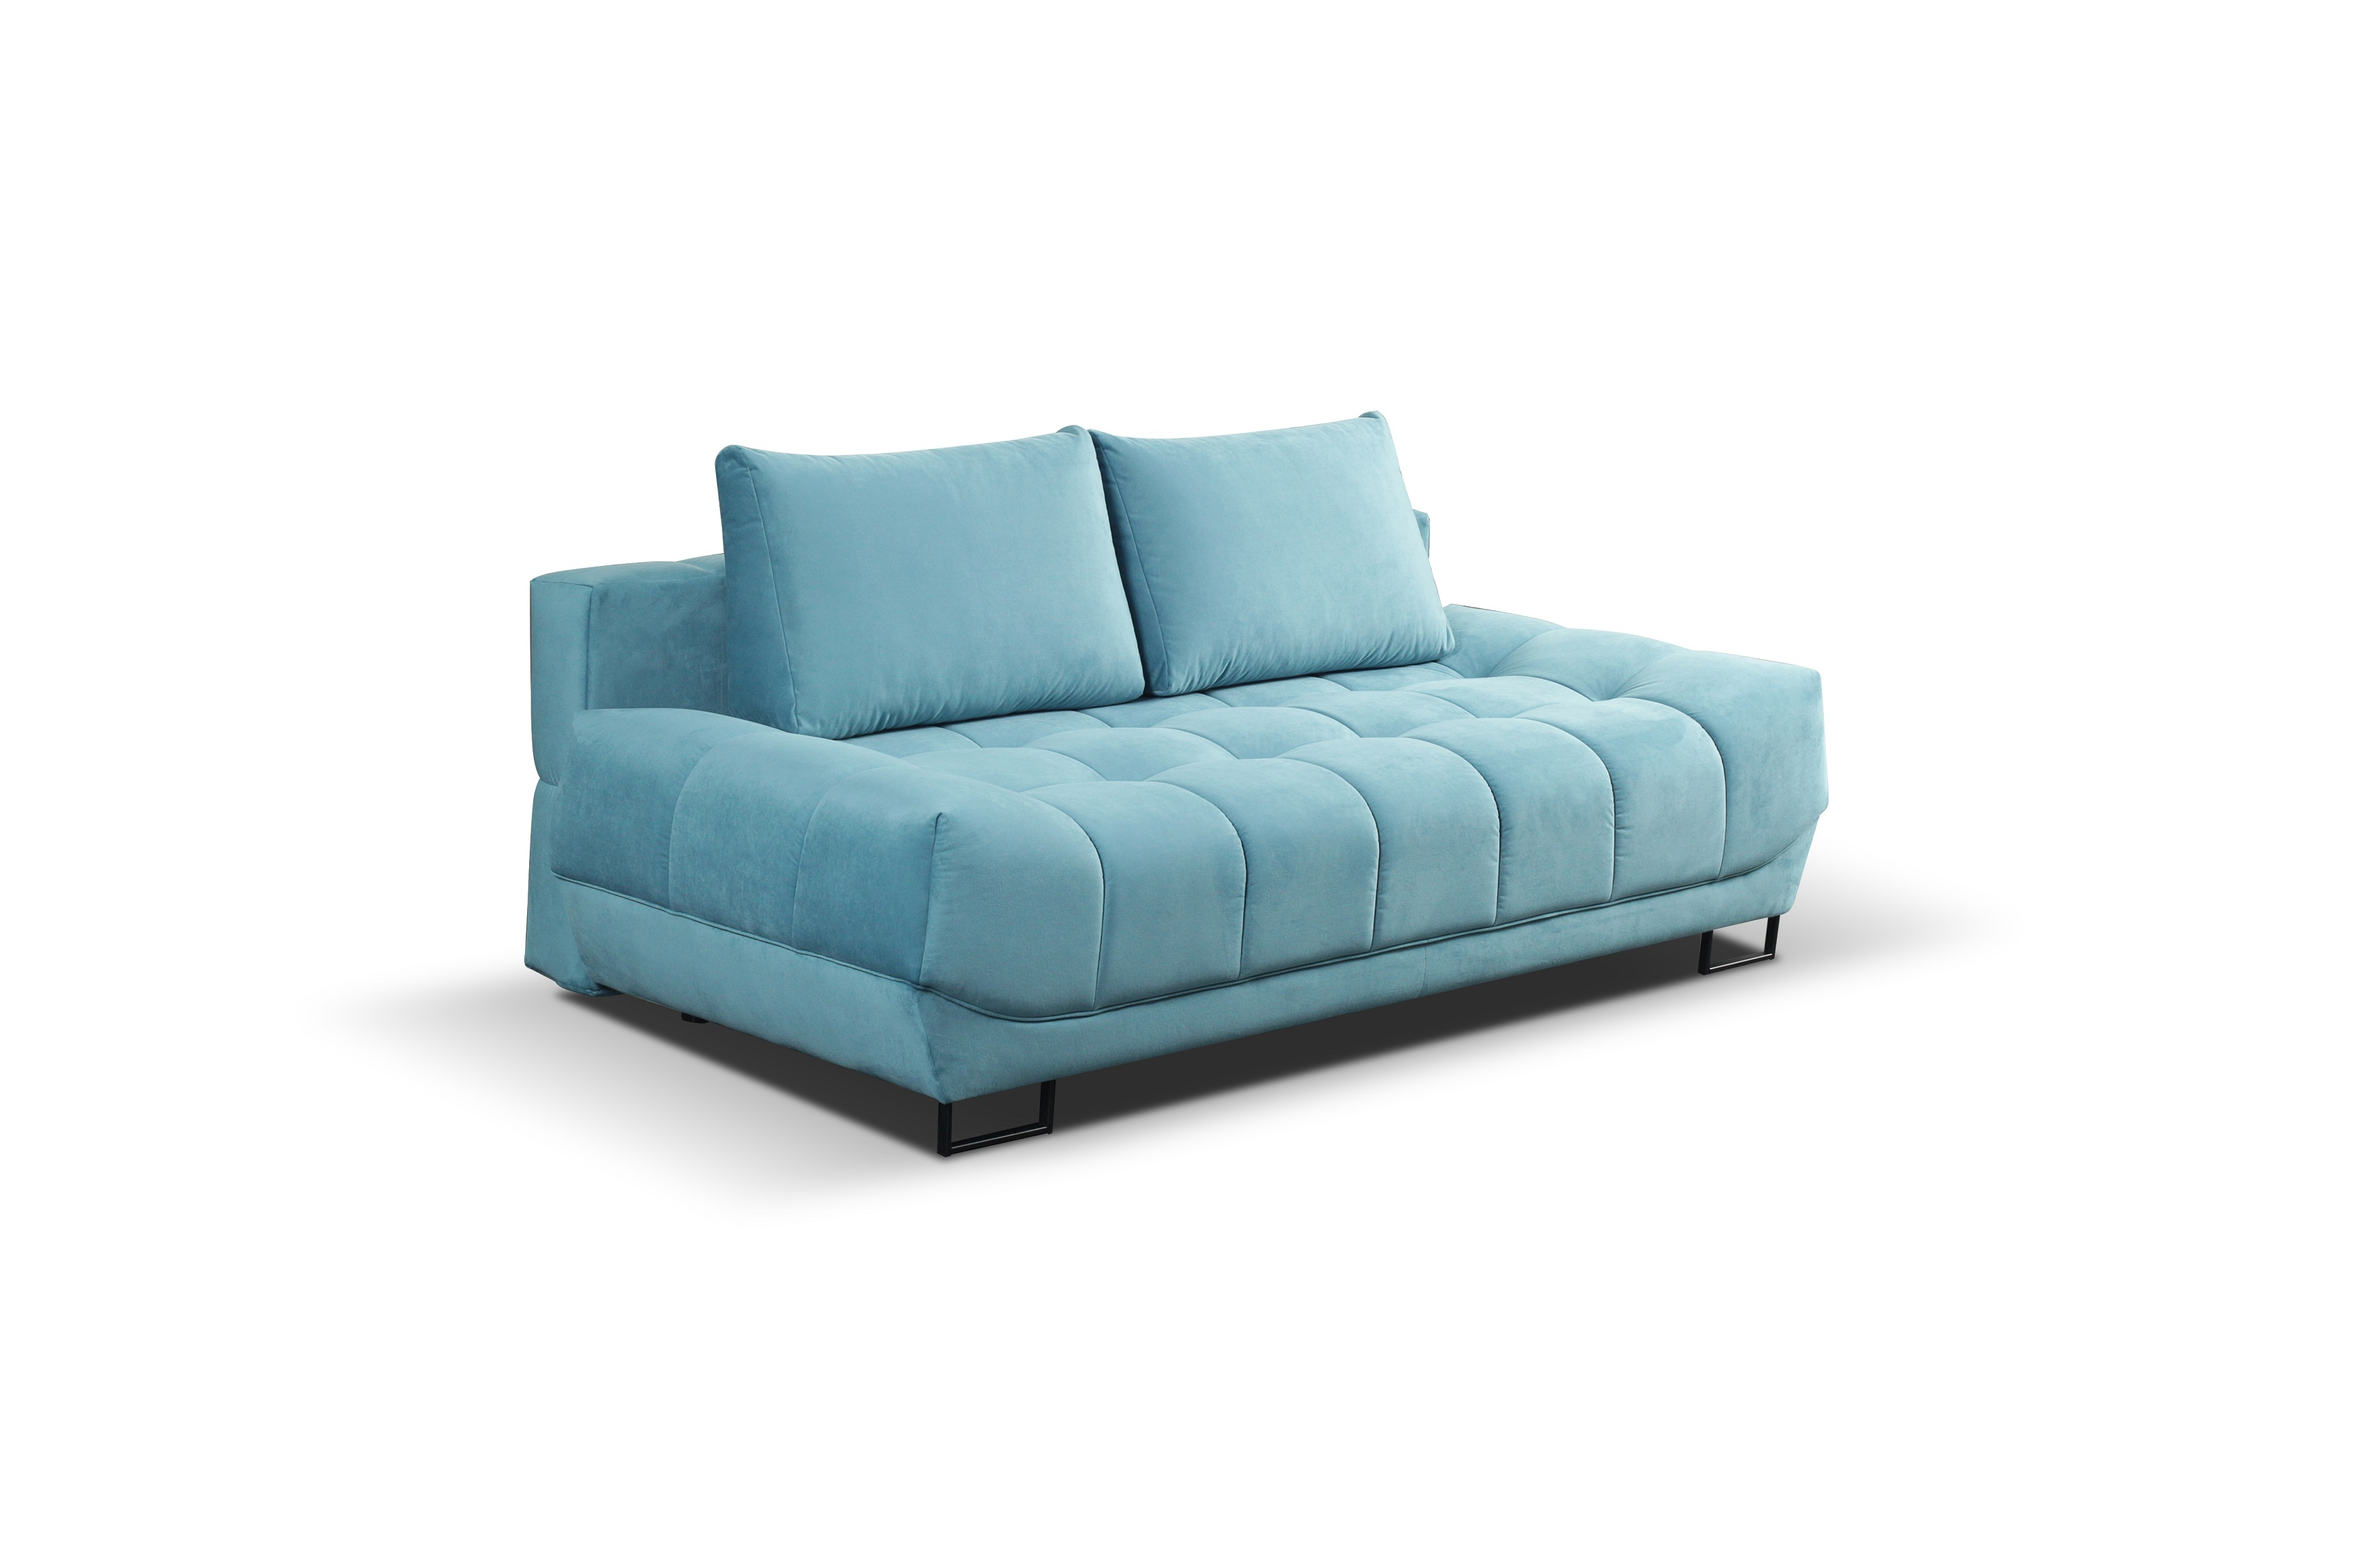 Canapea extensibila cu lada de depozitare, 3 locuri Venice, l218xA112xH71 cm imagine